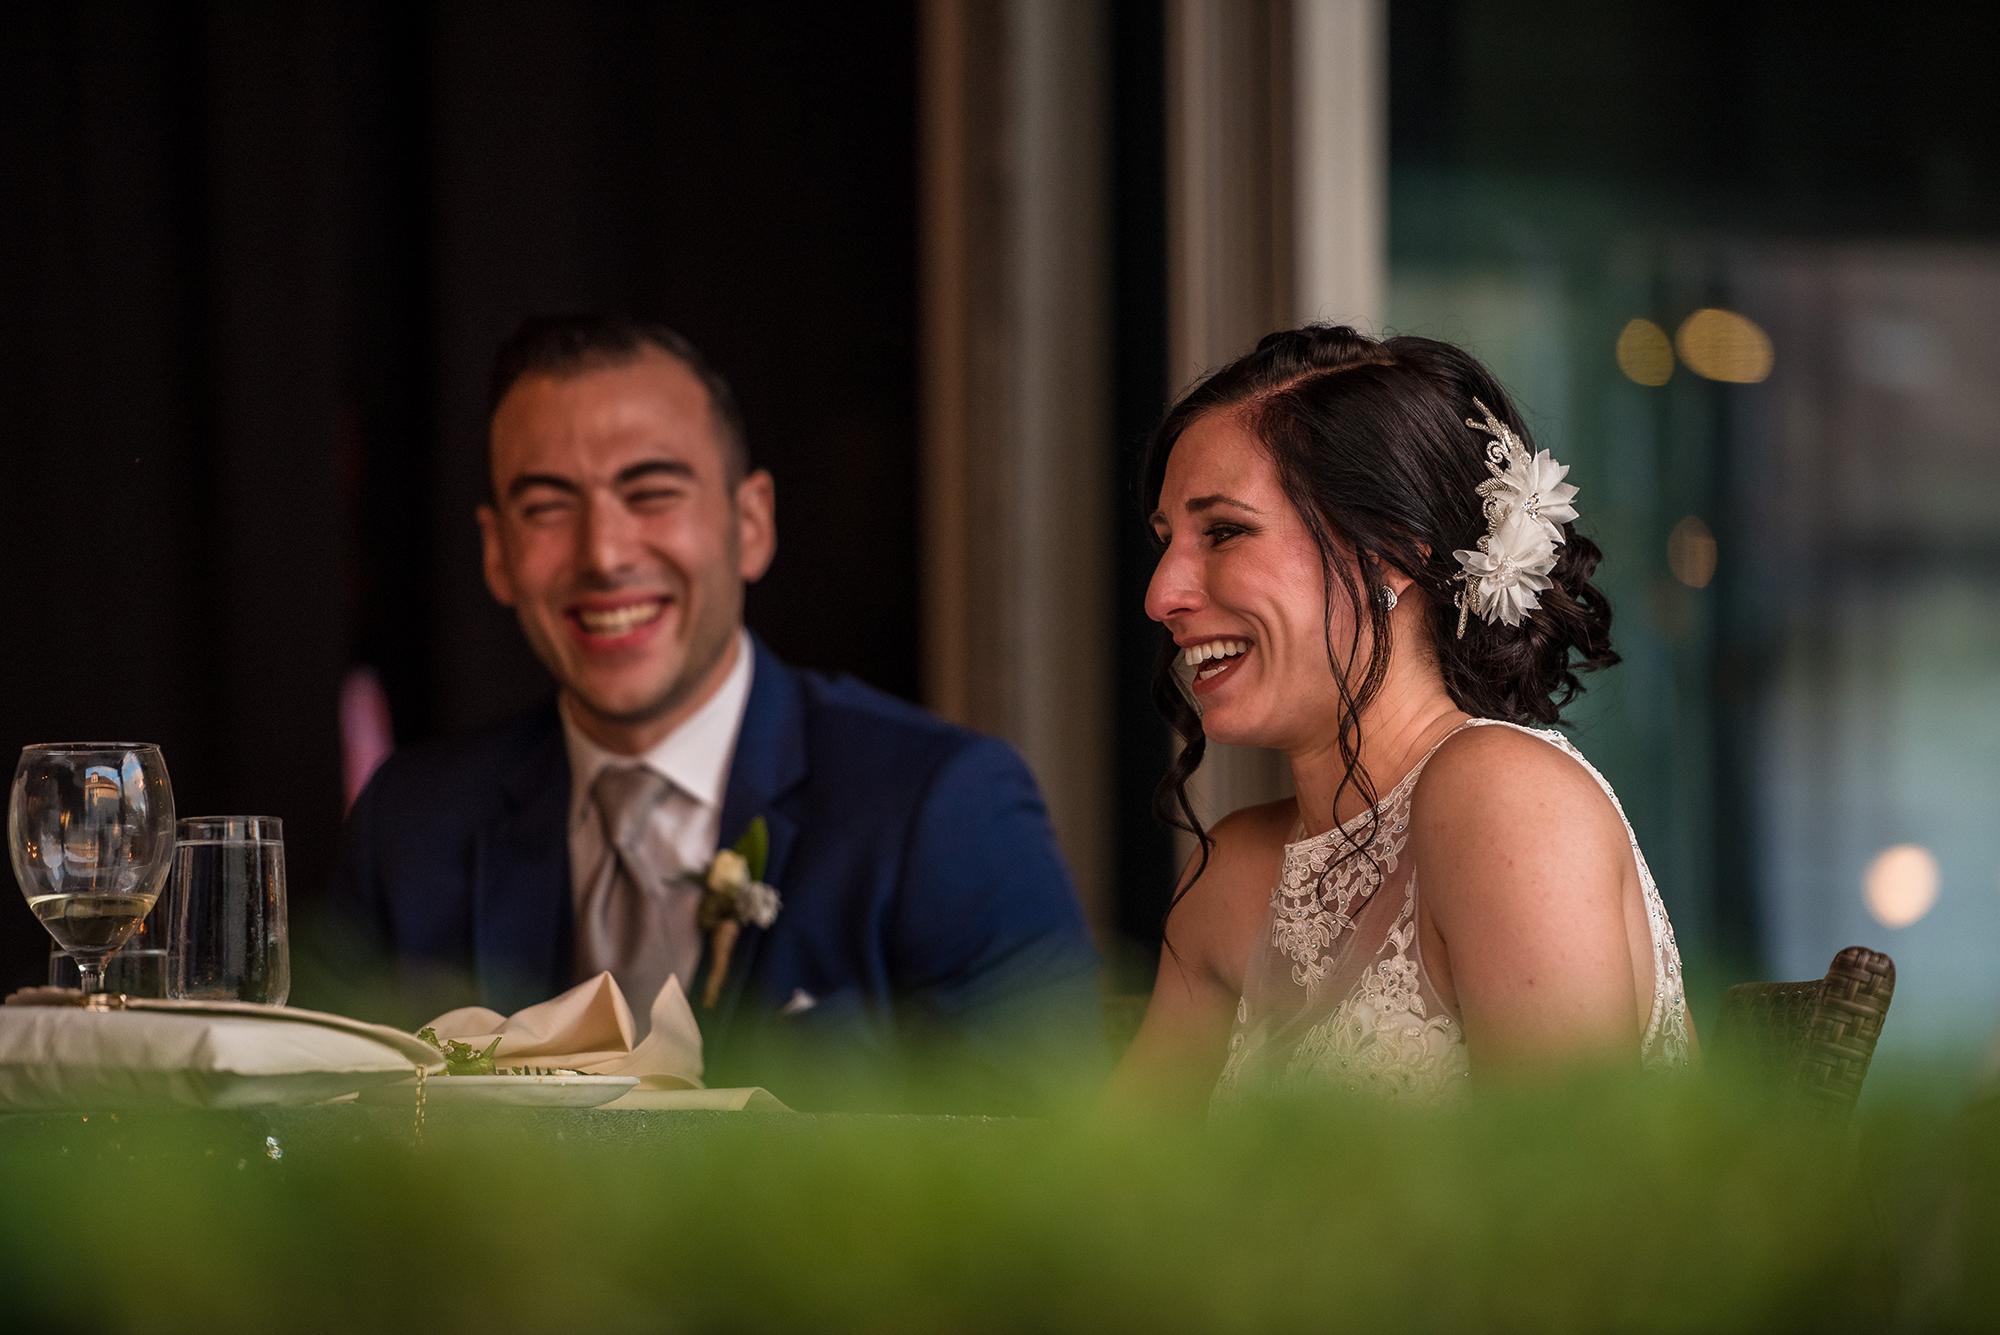 trenos-wedding-lbi-photographer-36.jpg